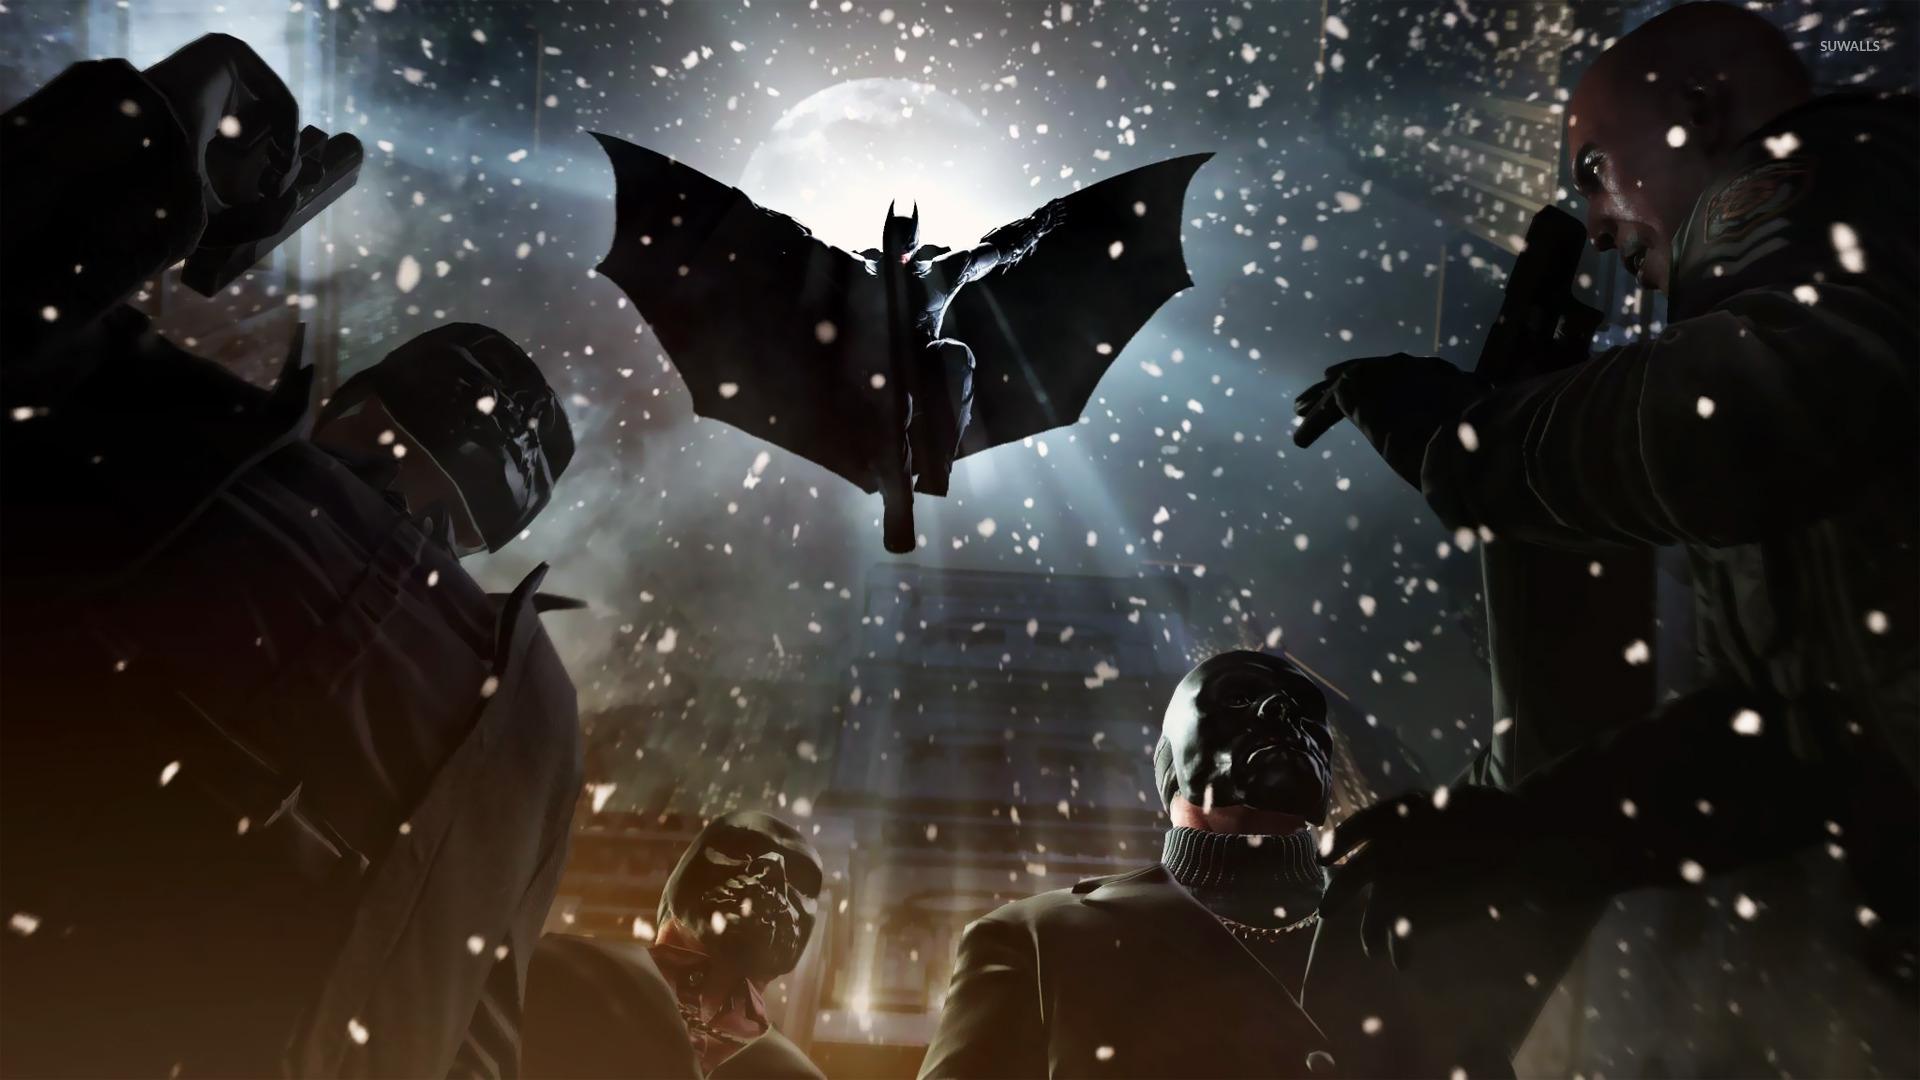 Joker Quotes Wallpaper Hd 1080p Batman Arkham Origins 3 Wallpaper Game Wallpapers